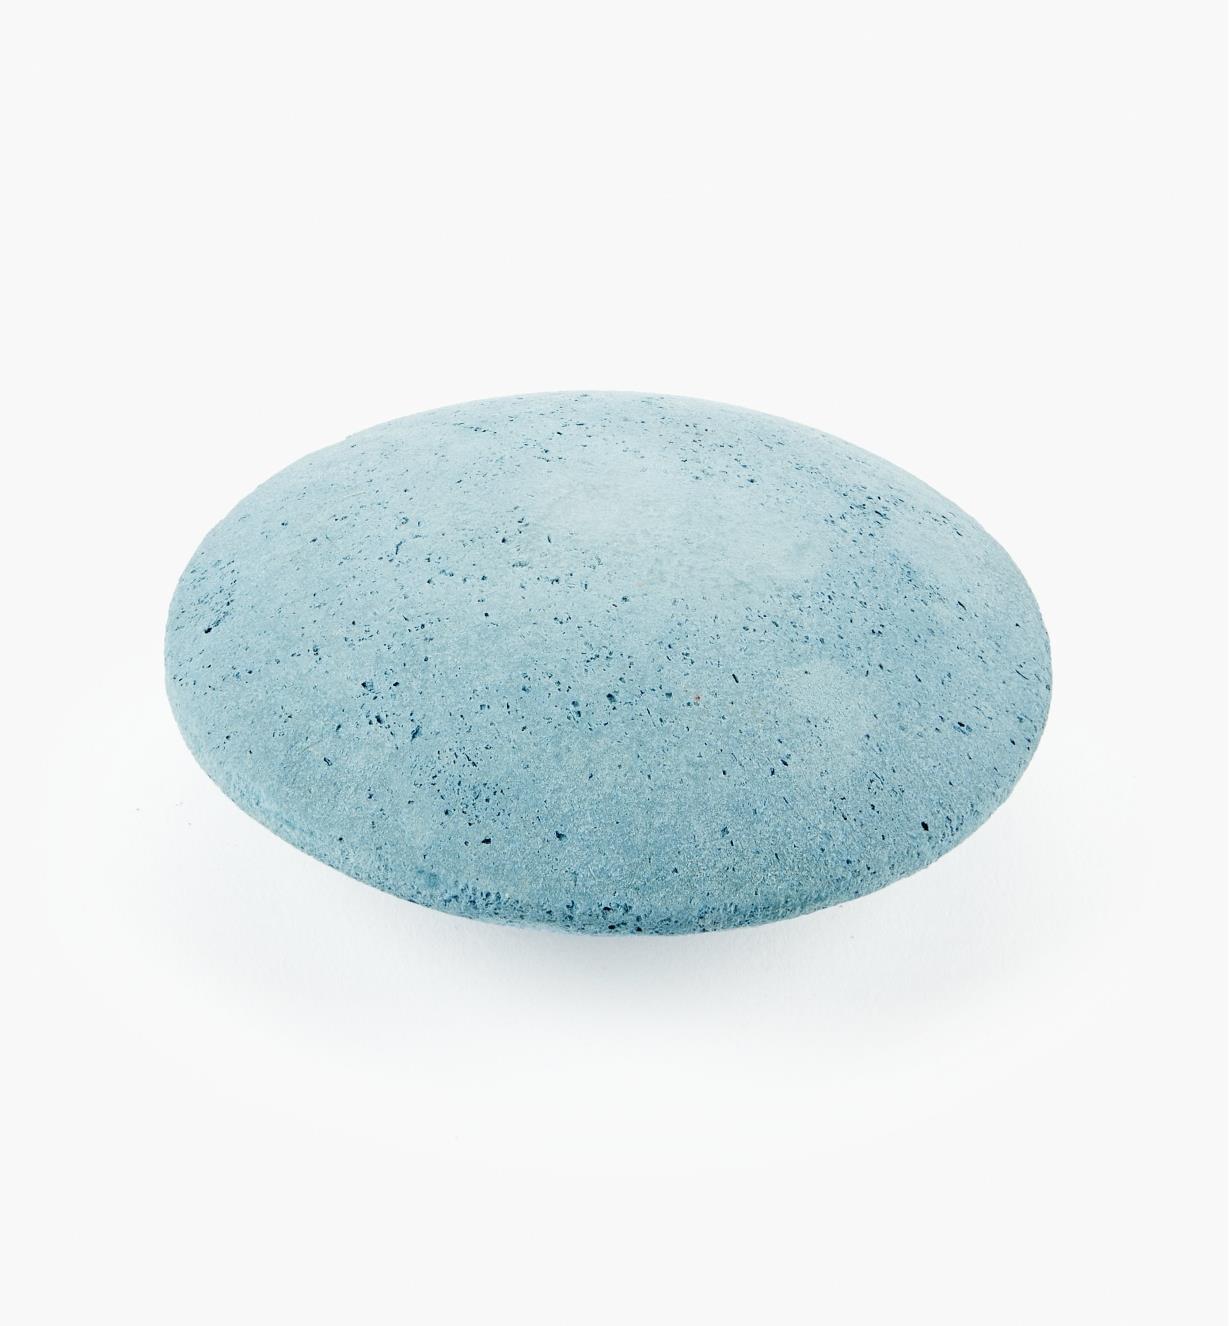 AB772 - Gardener's Clay Soap, Lavender